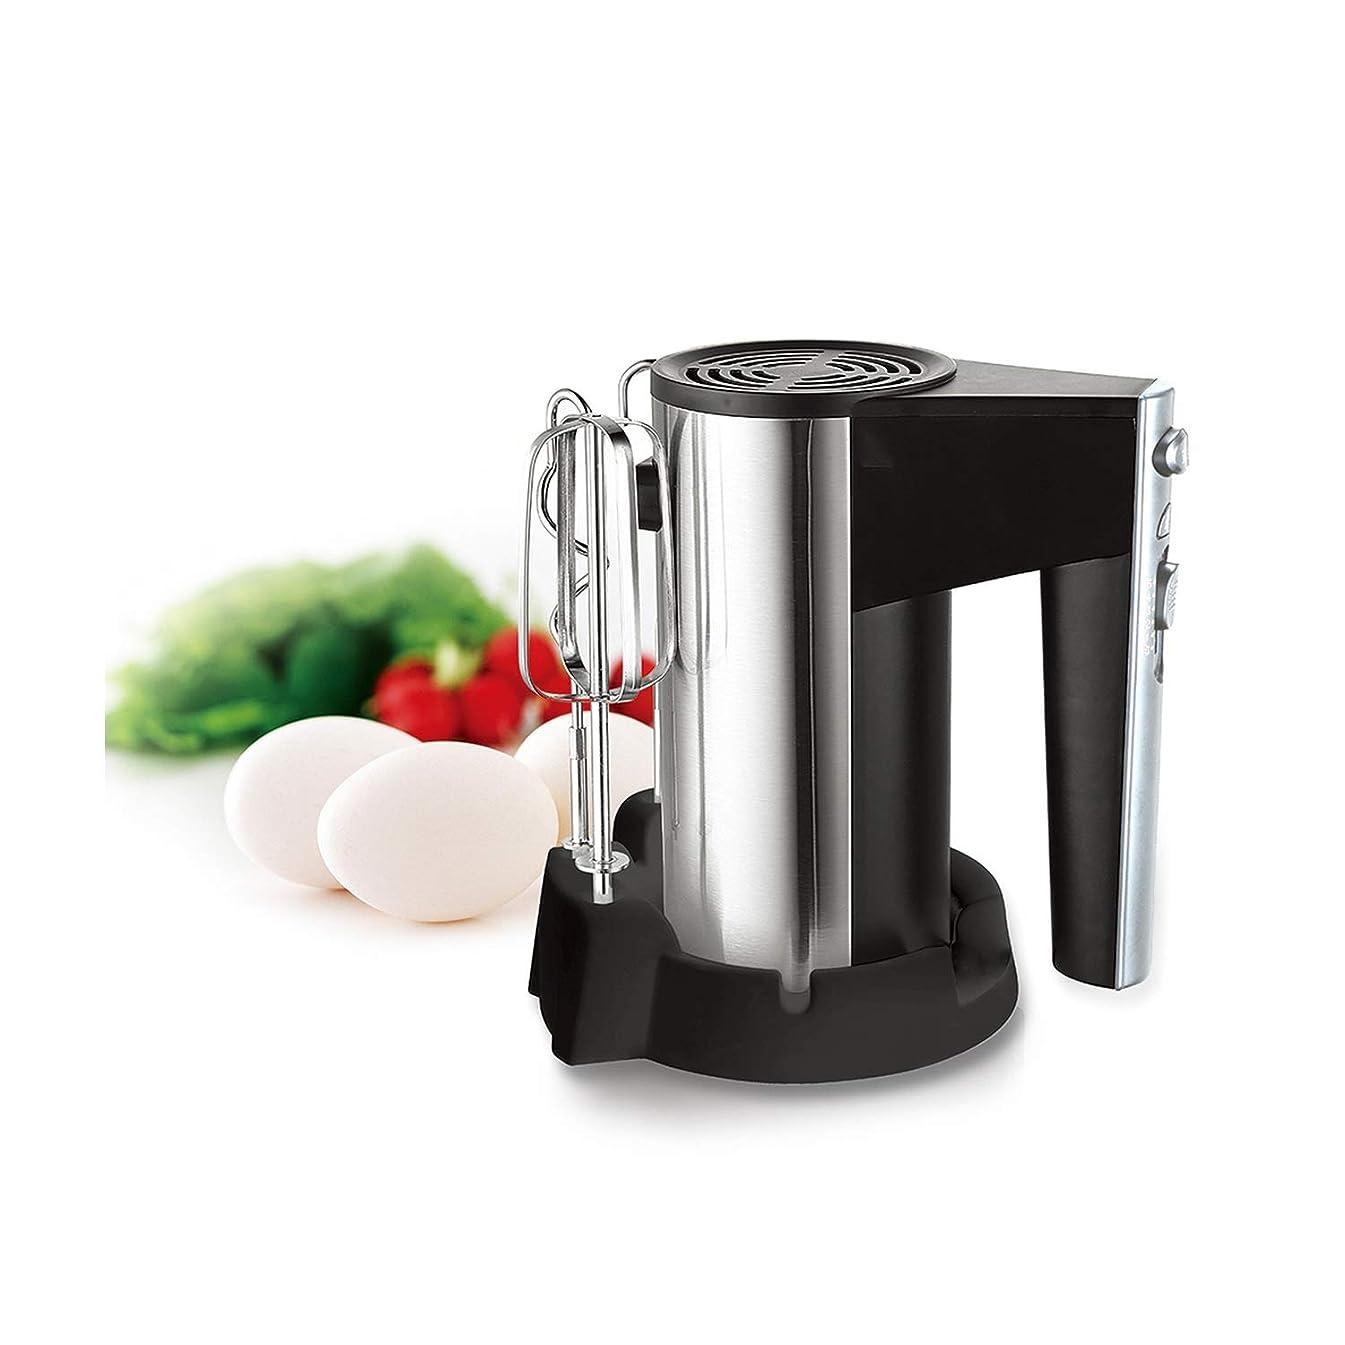 300W Stainless steel 5 speeds Food Mixers Dough Mixer Egg Beater 220v Food Blender for Kitchen,EU